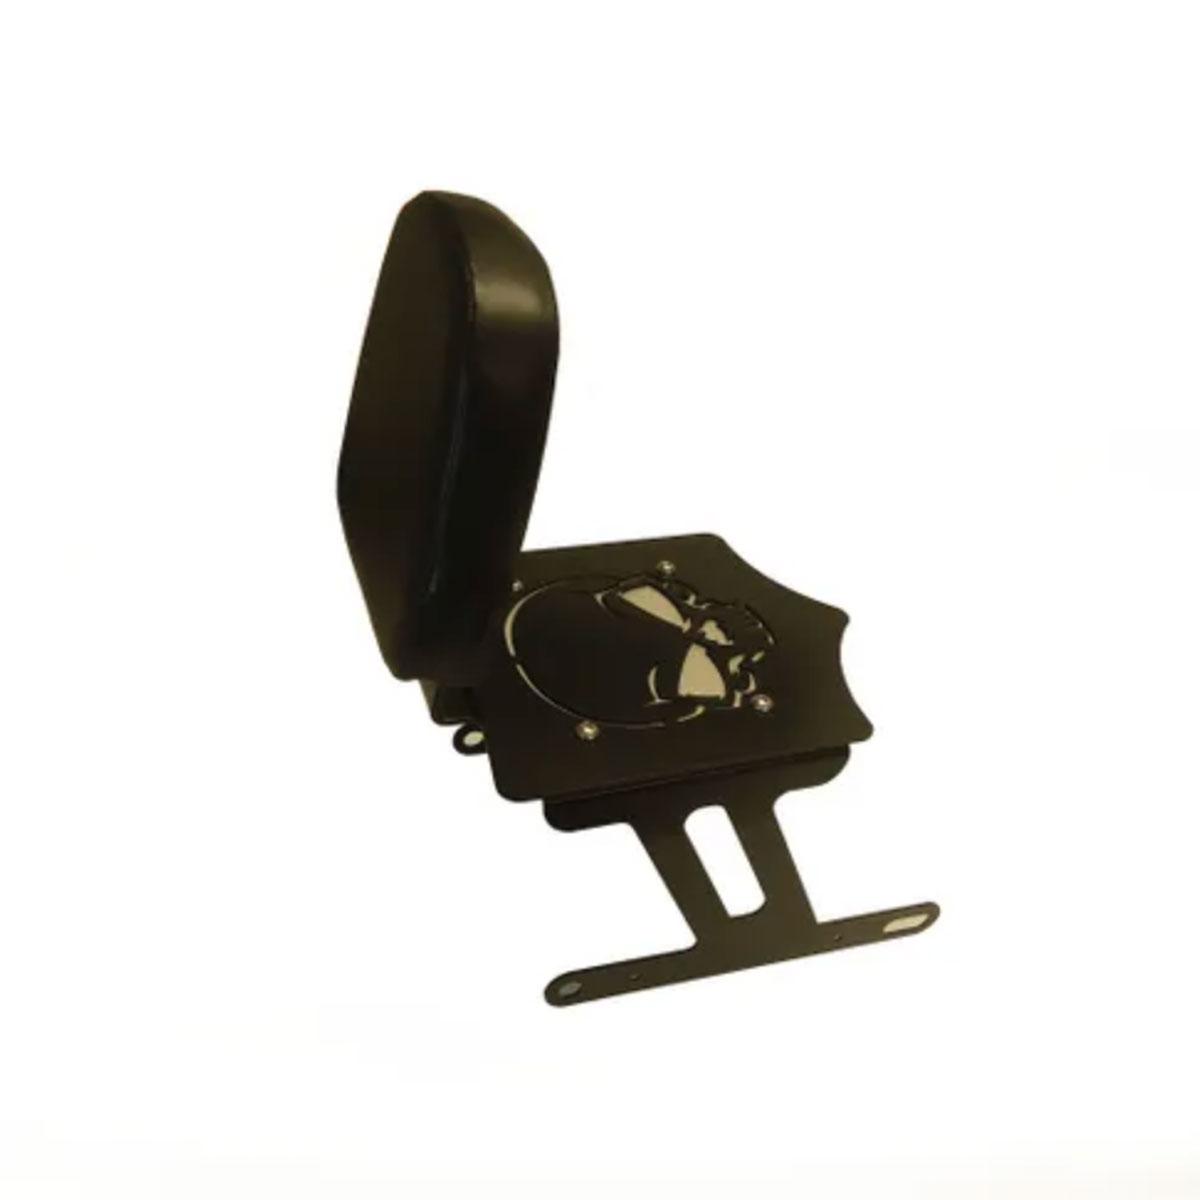 BDD Custom Black Skull Sissy Bar w/Luggage Rack & Backrest for 2-Up Seats